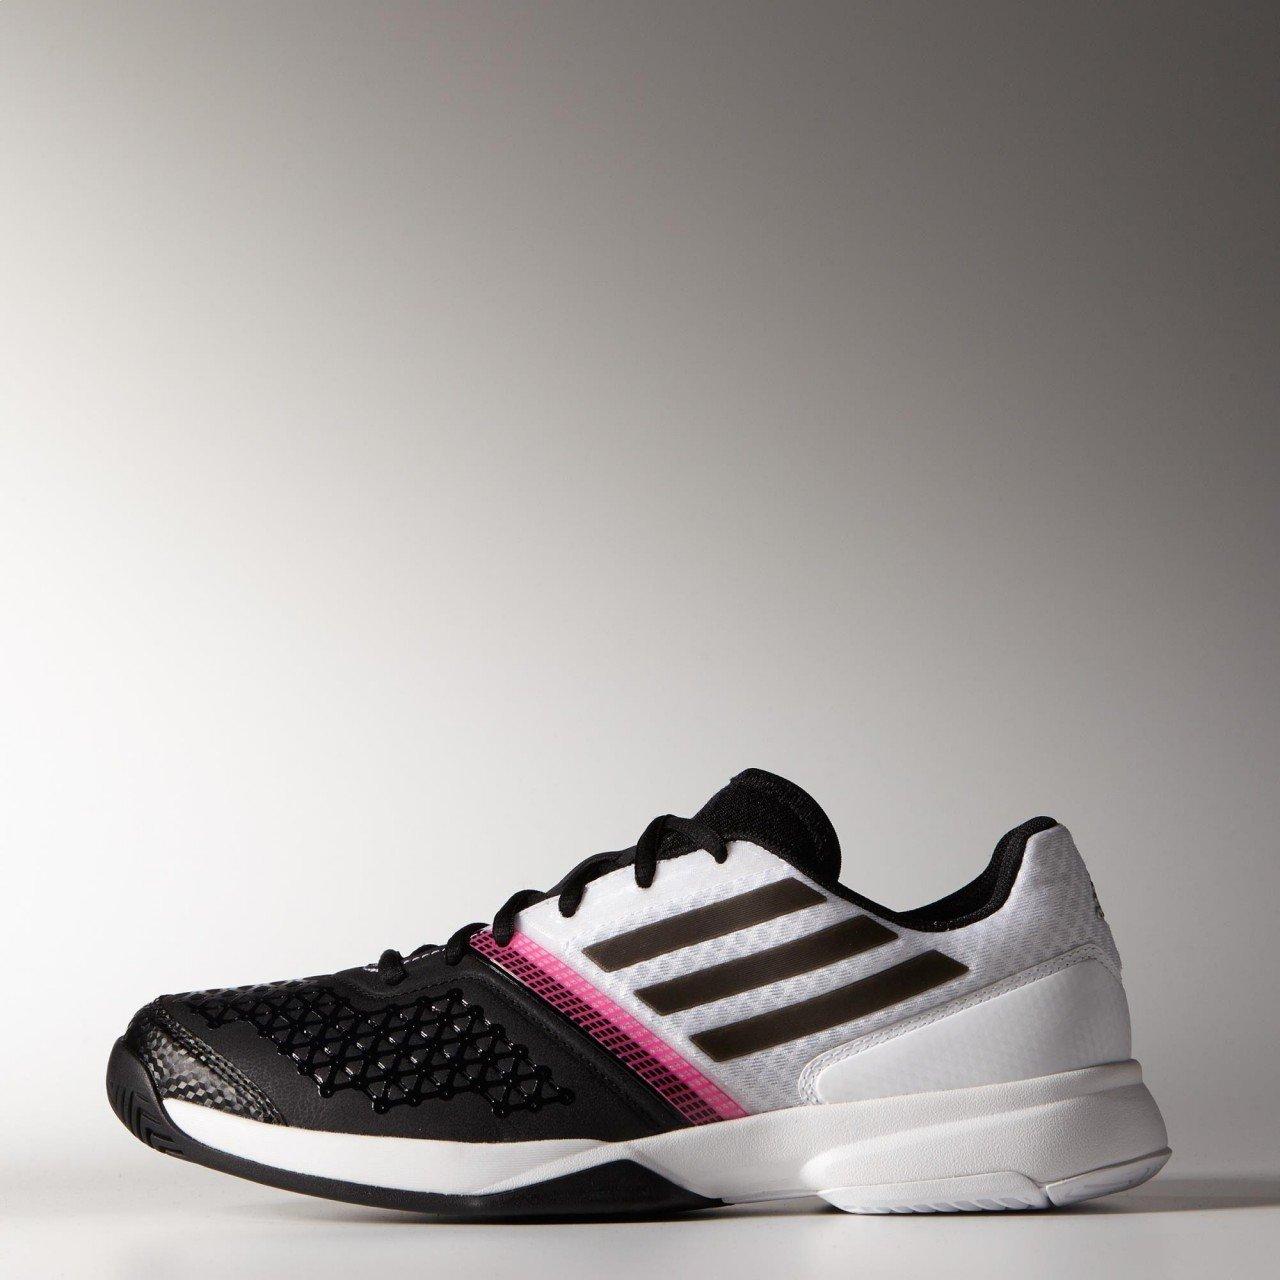 online store 25153 fe895 adidas Ace III B40855, Turnschuhe - EU 44 Amazon.de Schuhe  Handtaschen